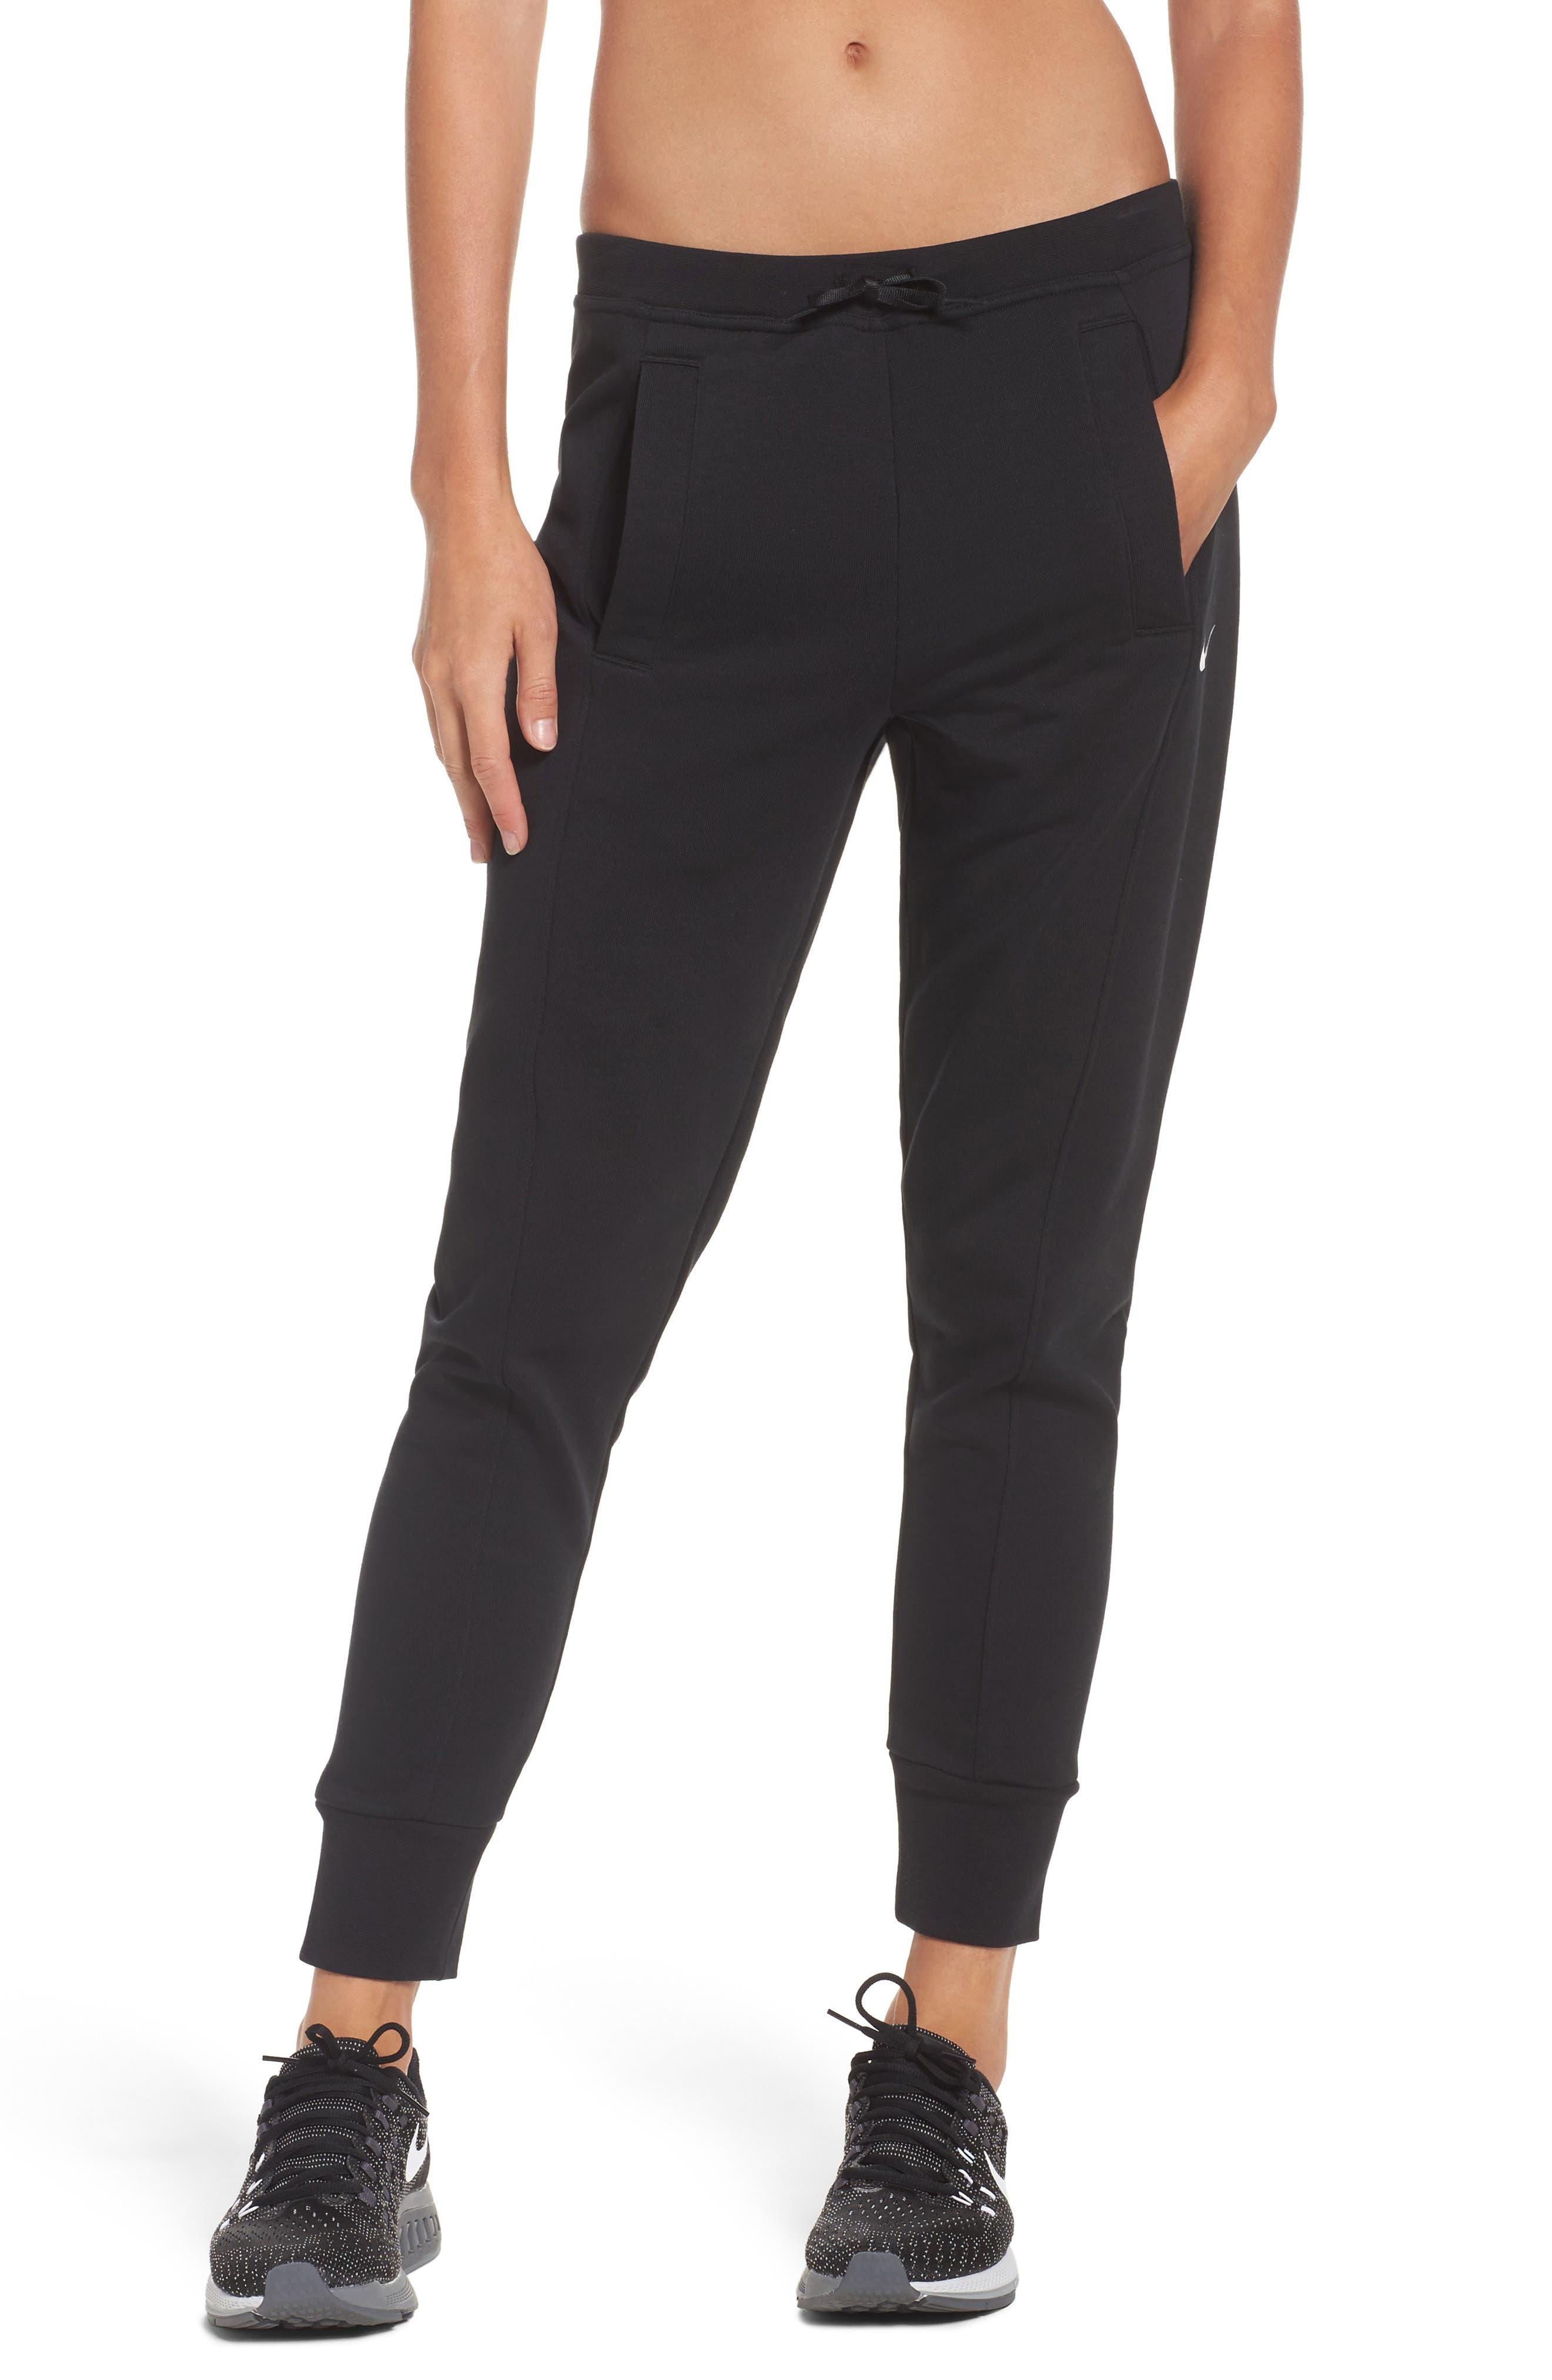 Nike Versa Track Pants